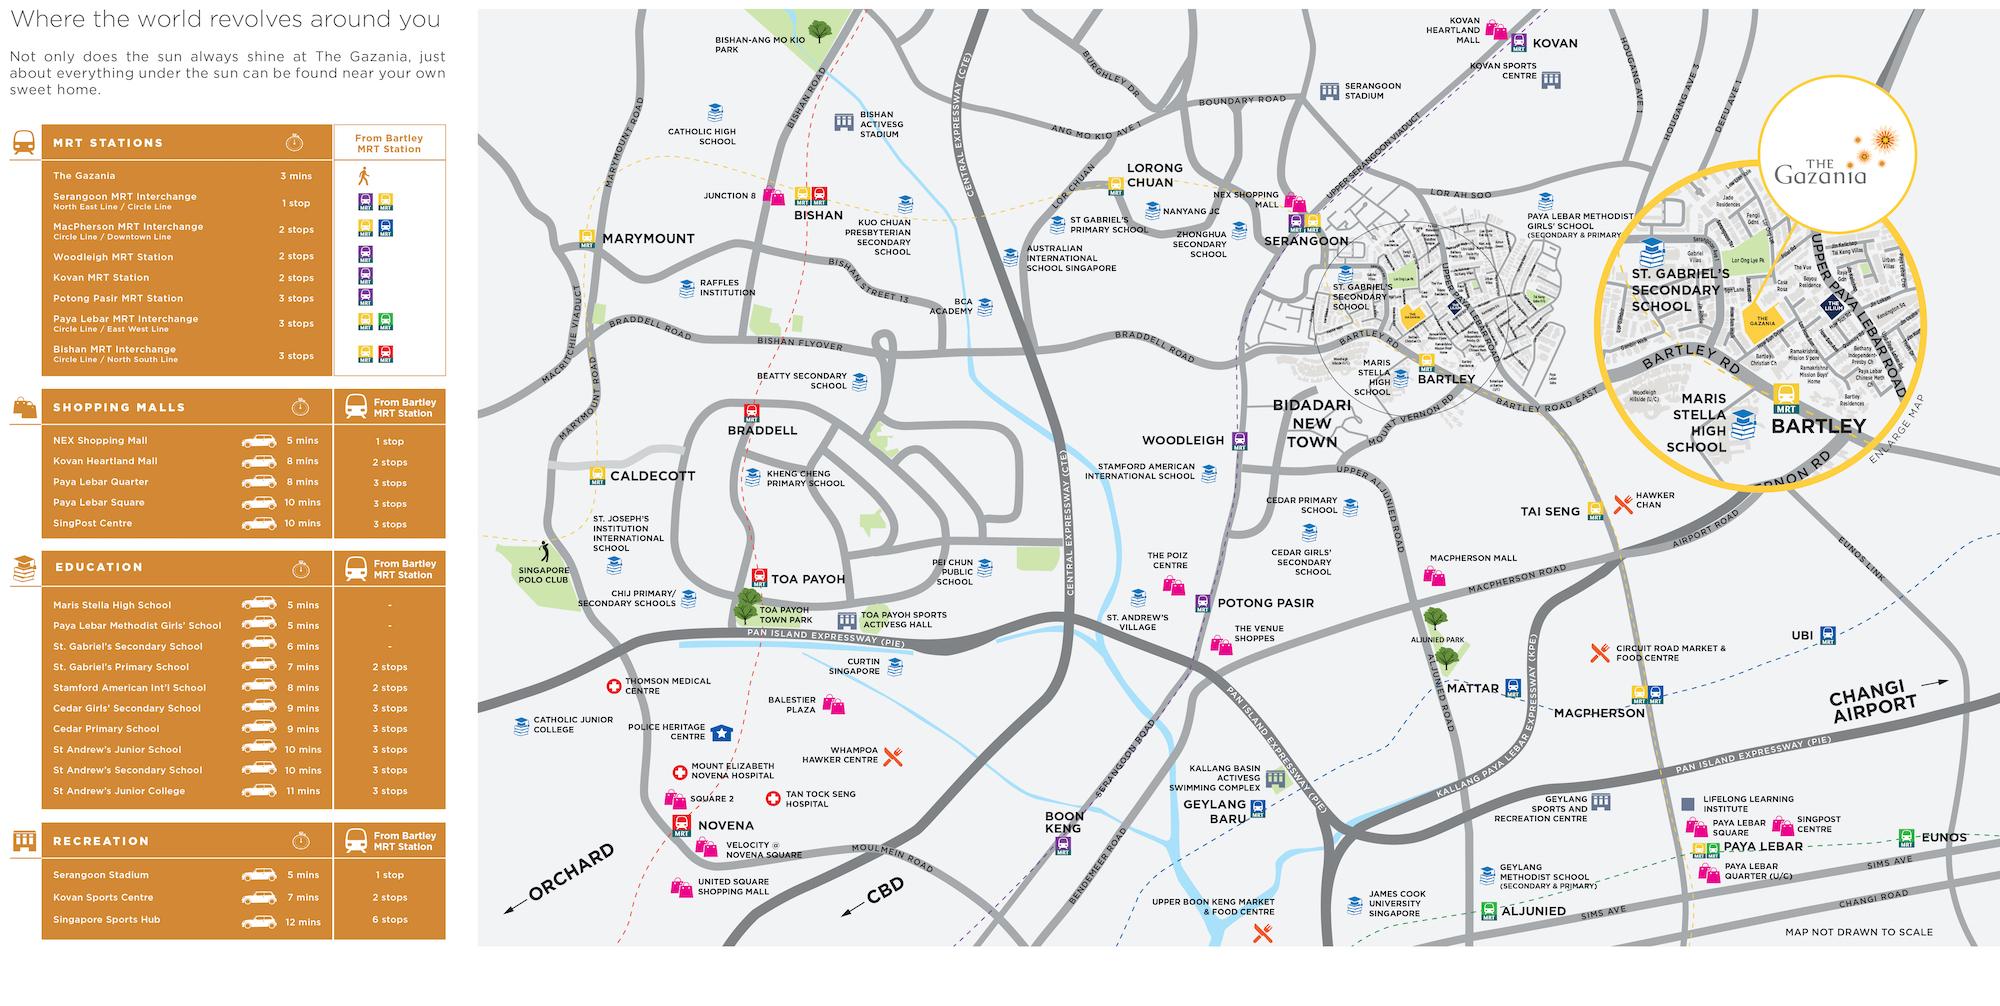 The-Gazania-new-condo-singapore-location-map-1